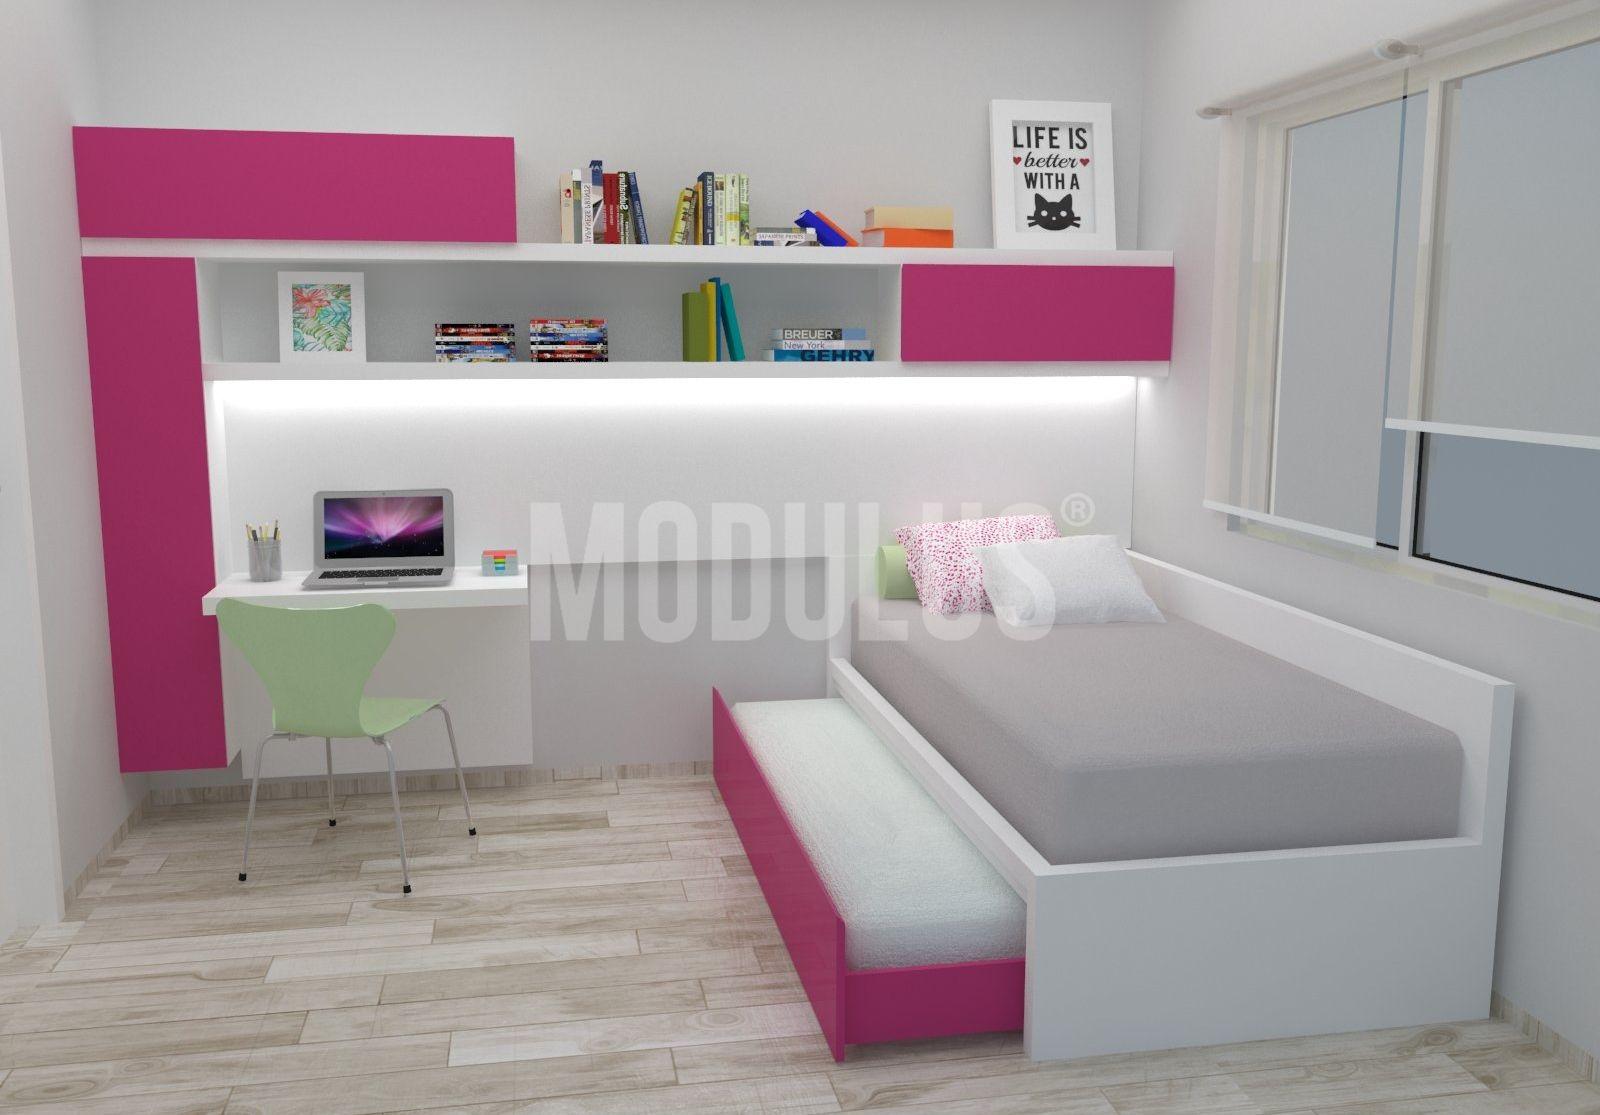 Dormitorio Infantil A Medida Modulus Proyectos Pinterest  ~ Dormitorios Infantiles A Medida